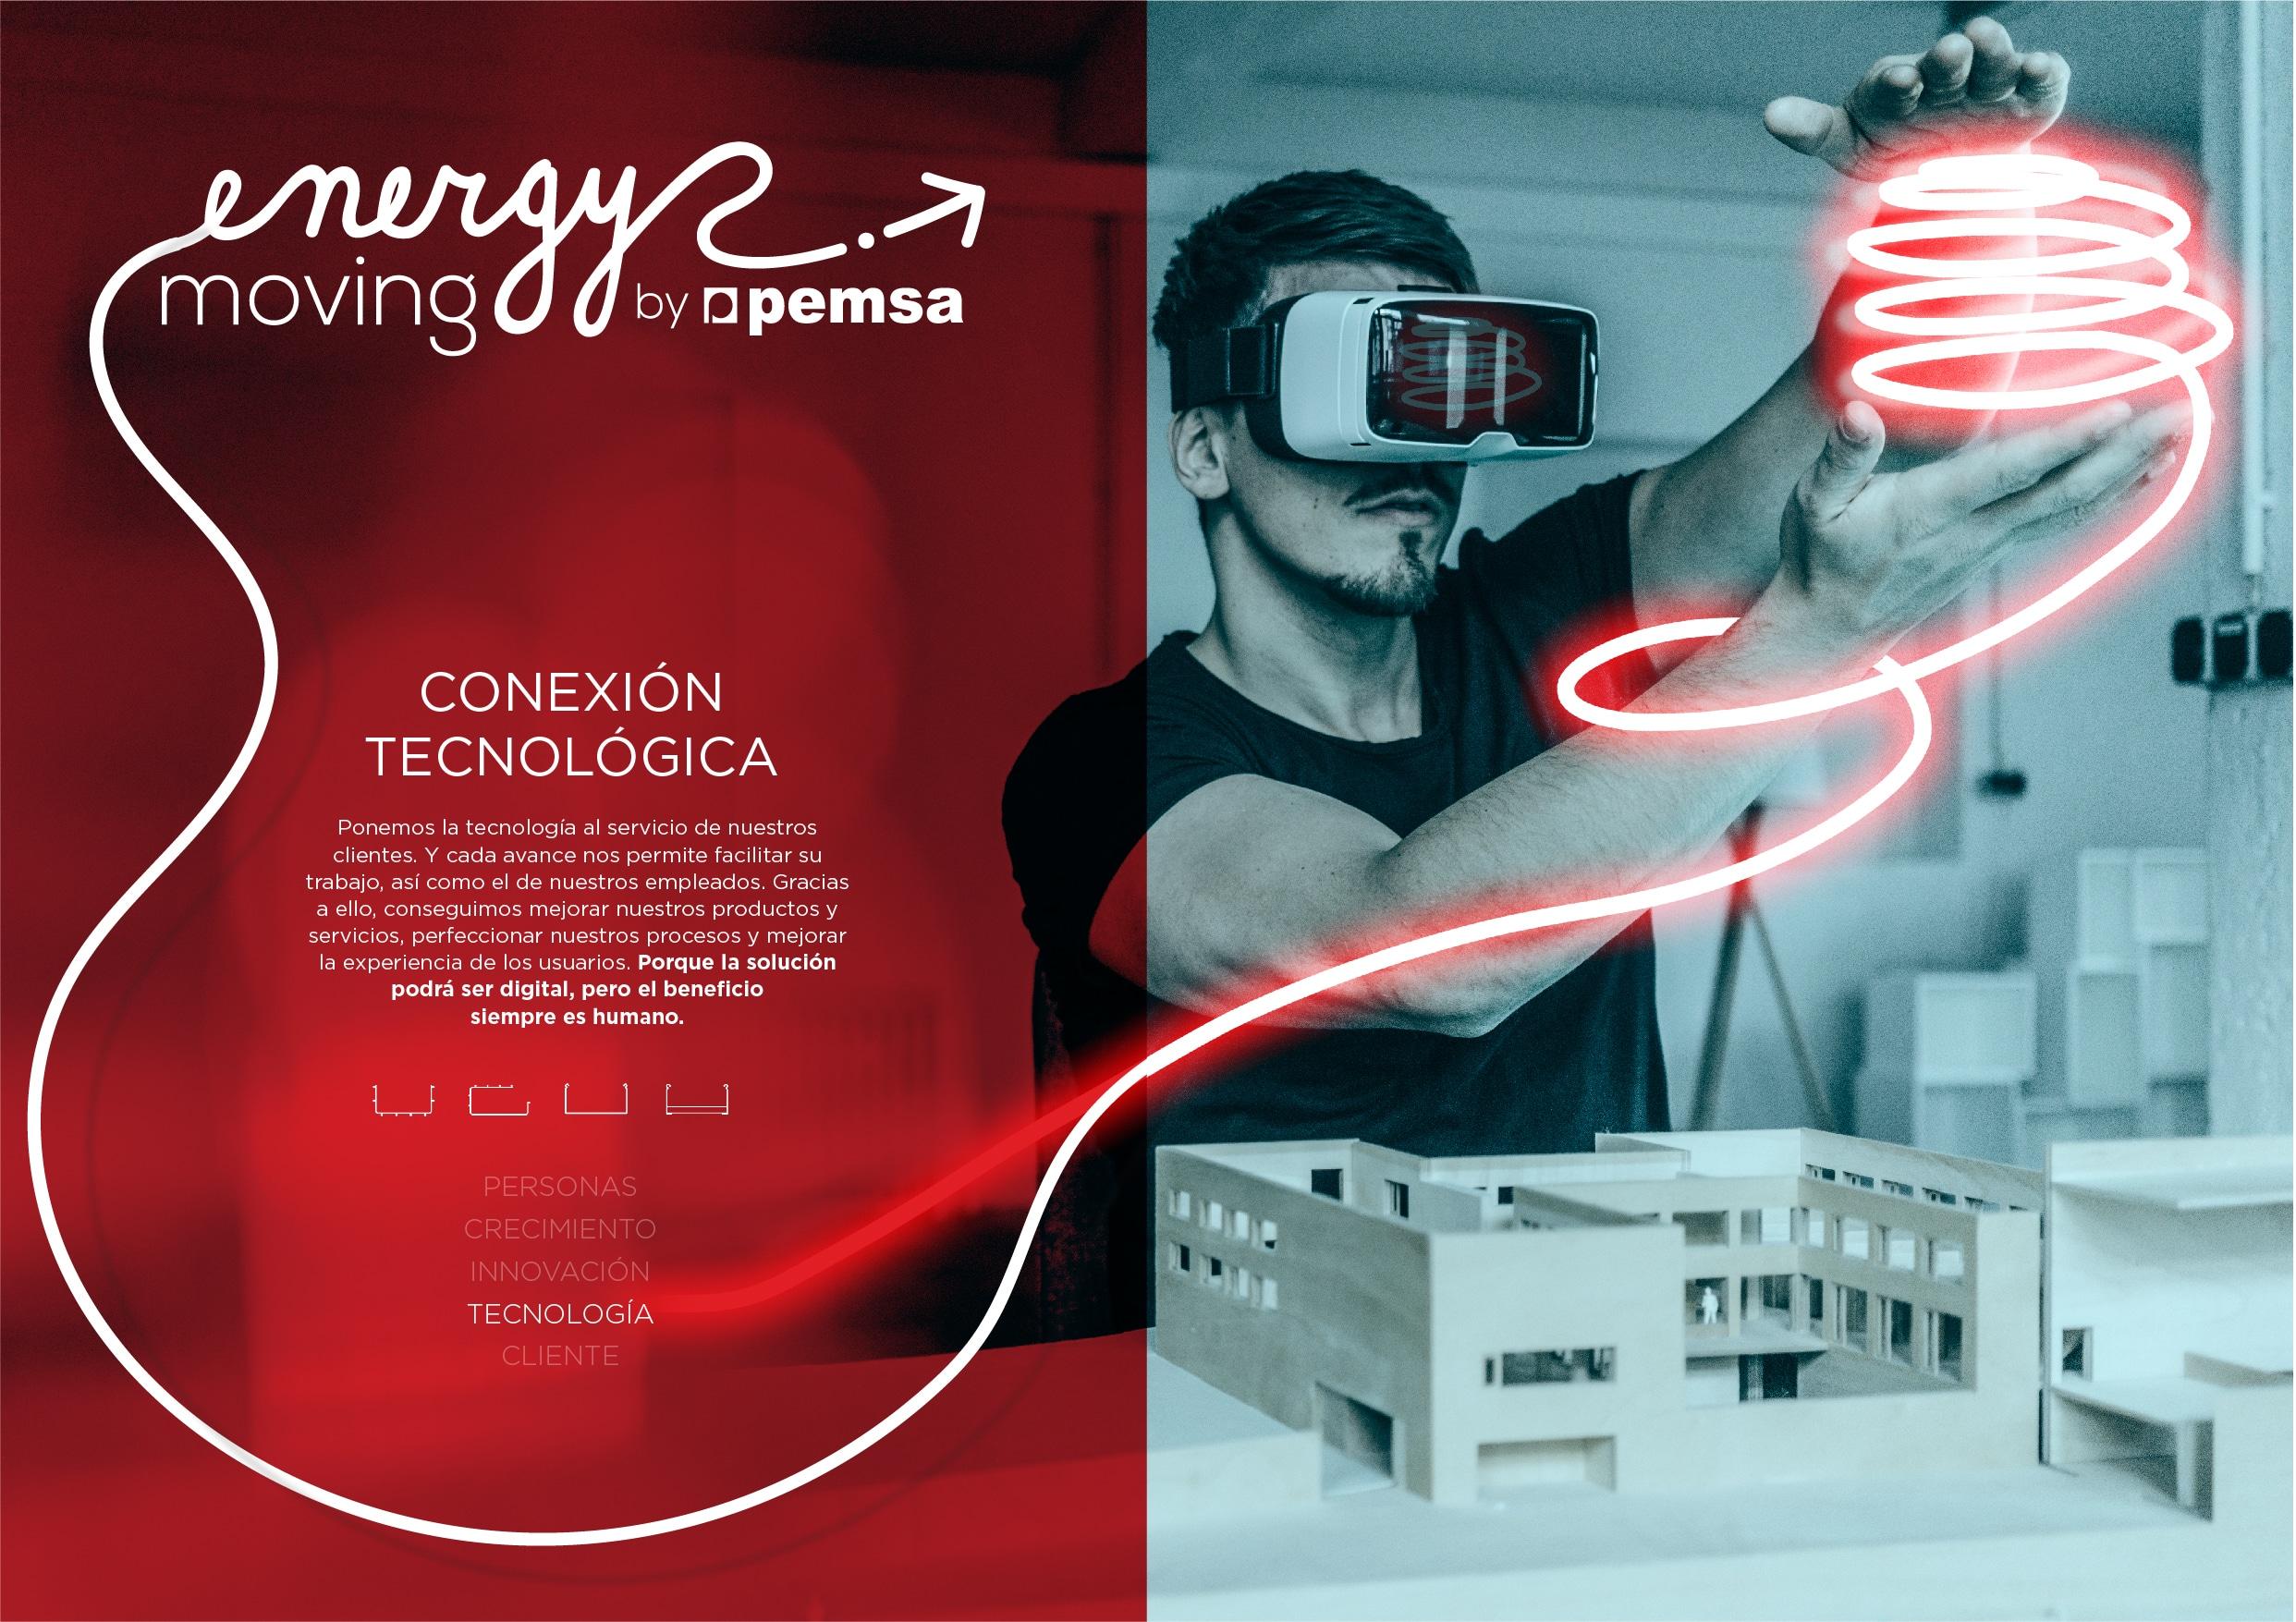 tecnologia_energy_moving